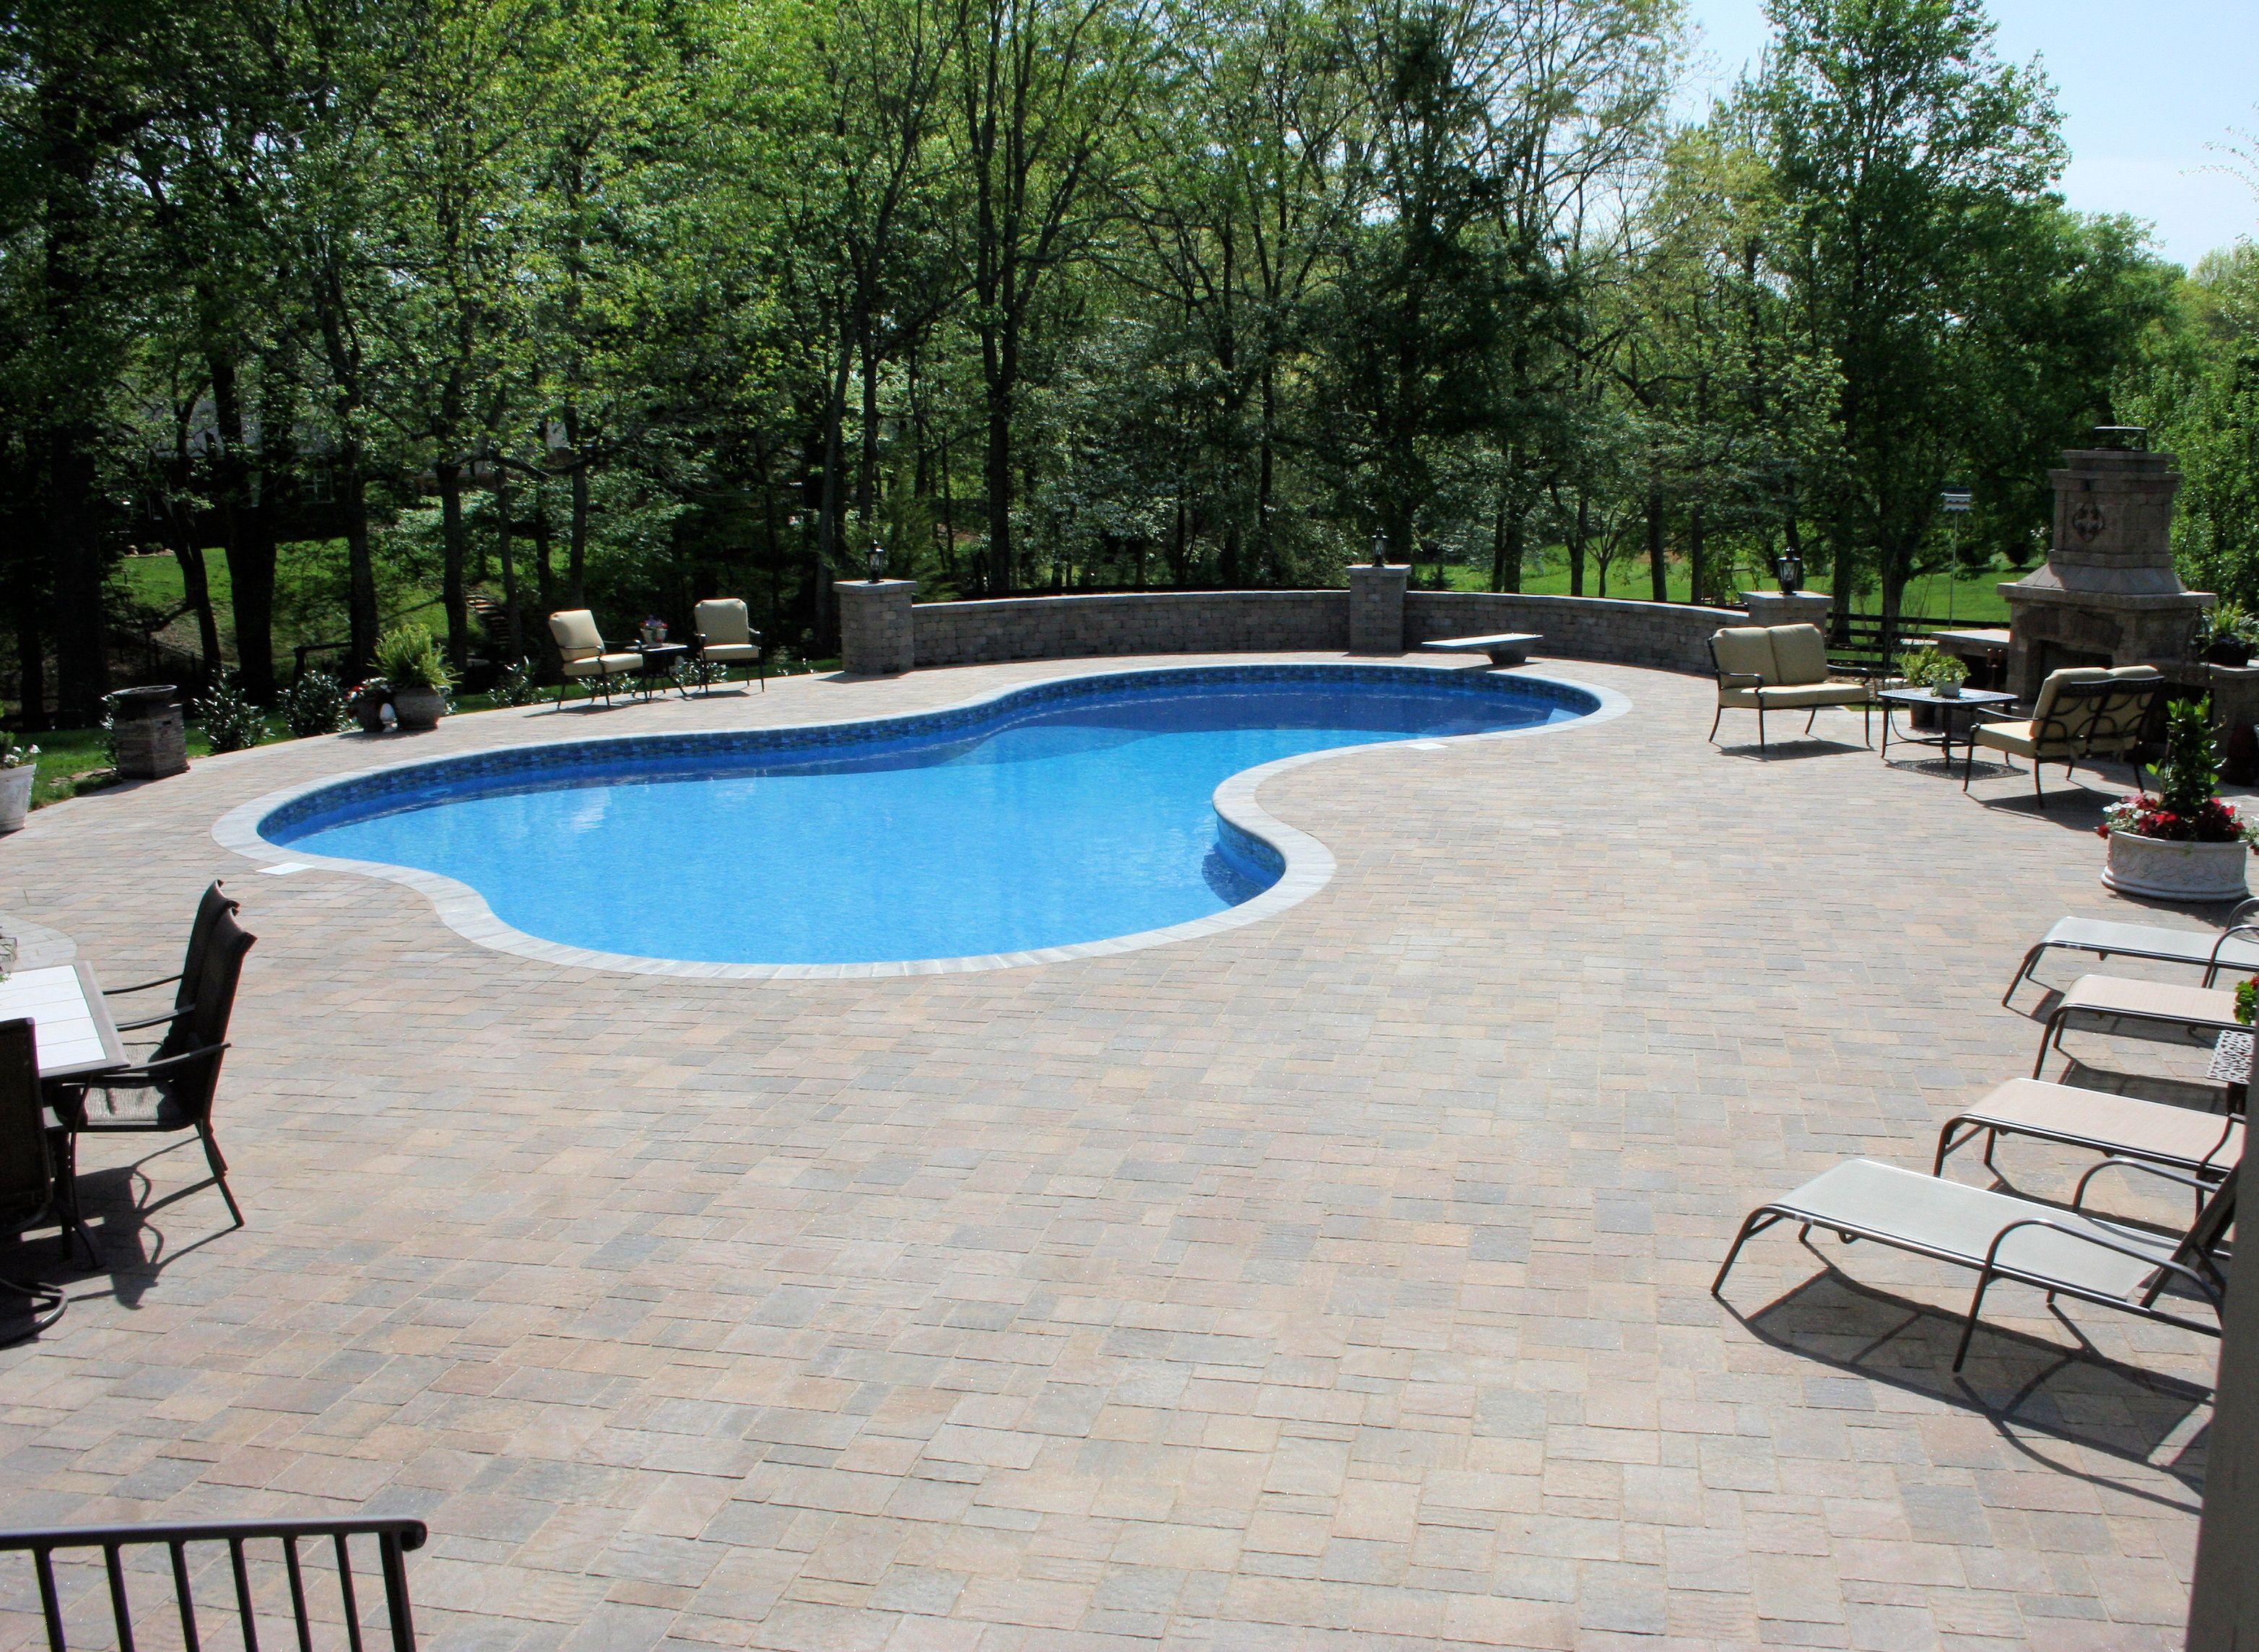 Matrix Swimming Pool And Belgard Urbana Pavers Stately Scapes